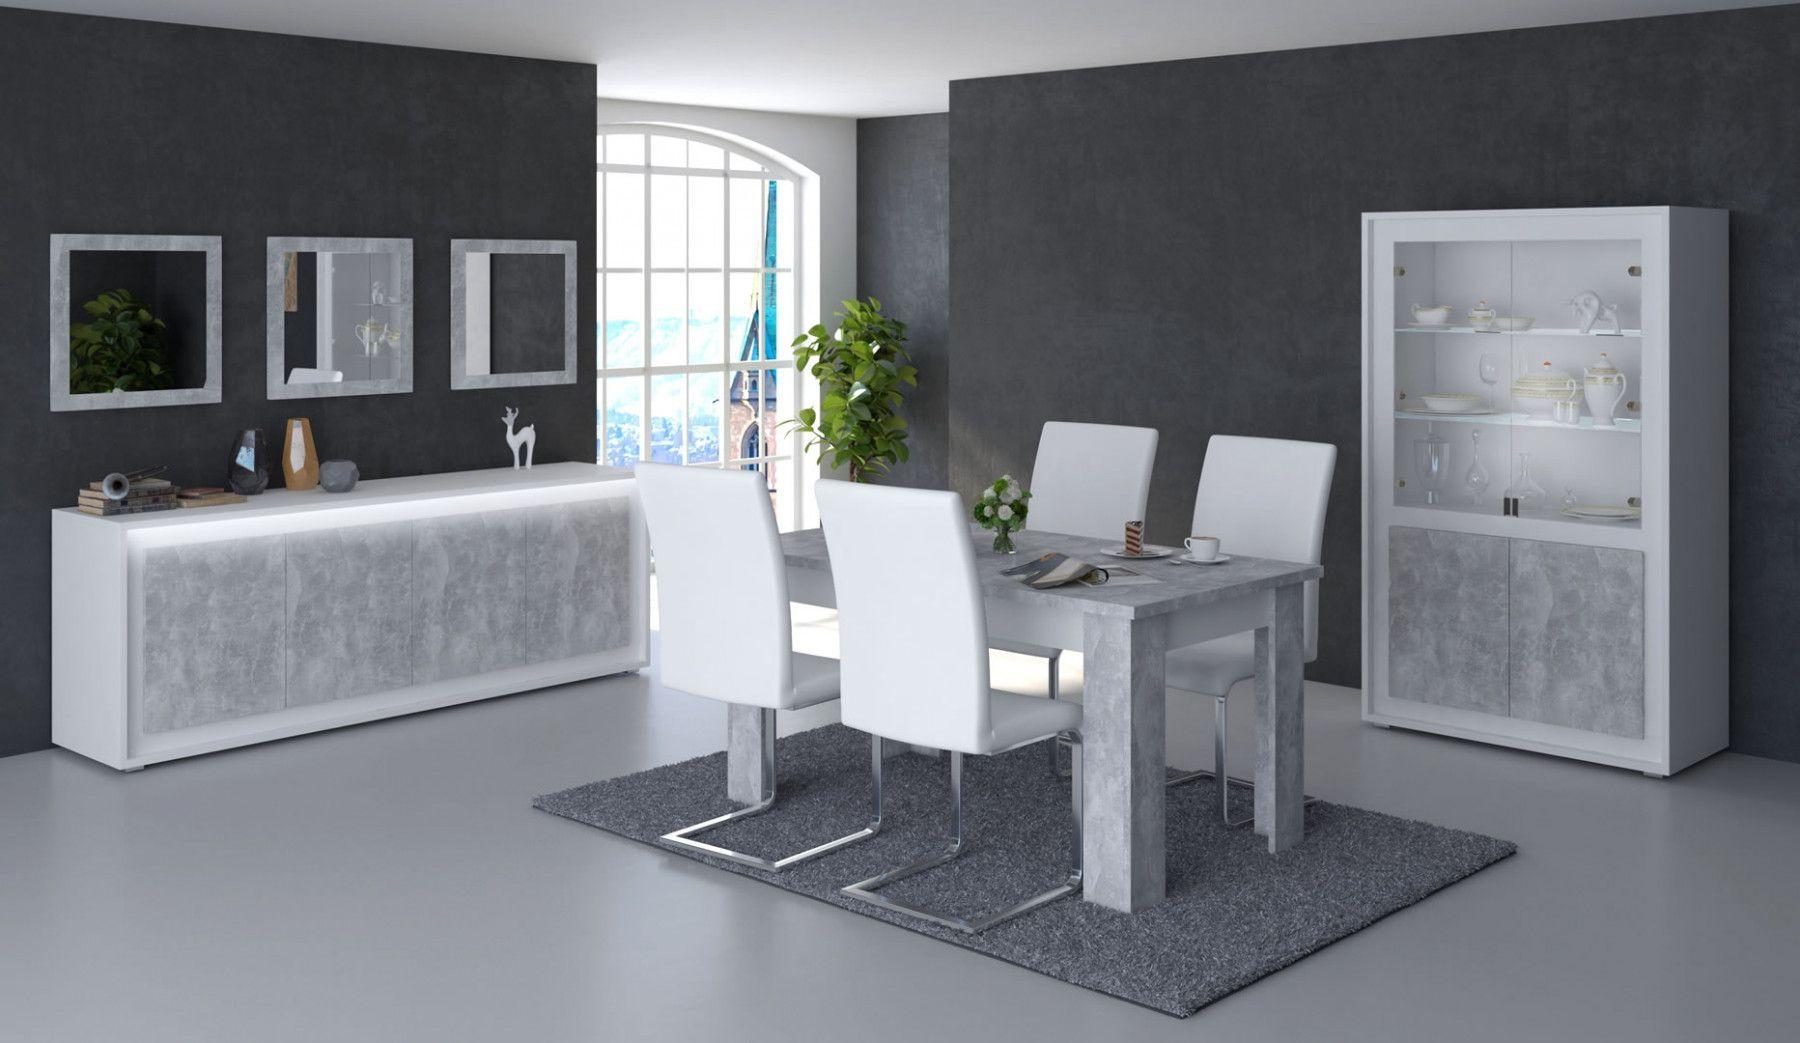 salle manger design salle manger compl te table 160 cm neon blanche et grise effet b ton. Black Bedroom Furniture Sets. Home Design Ideas